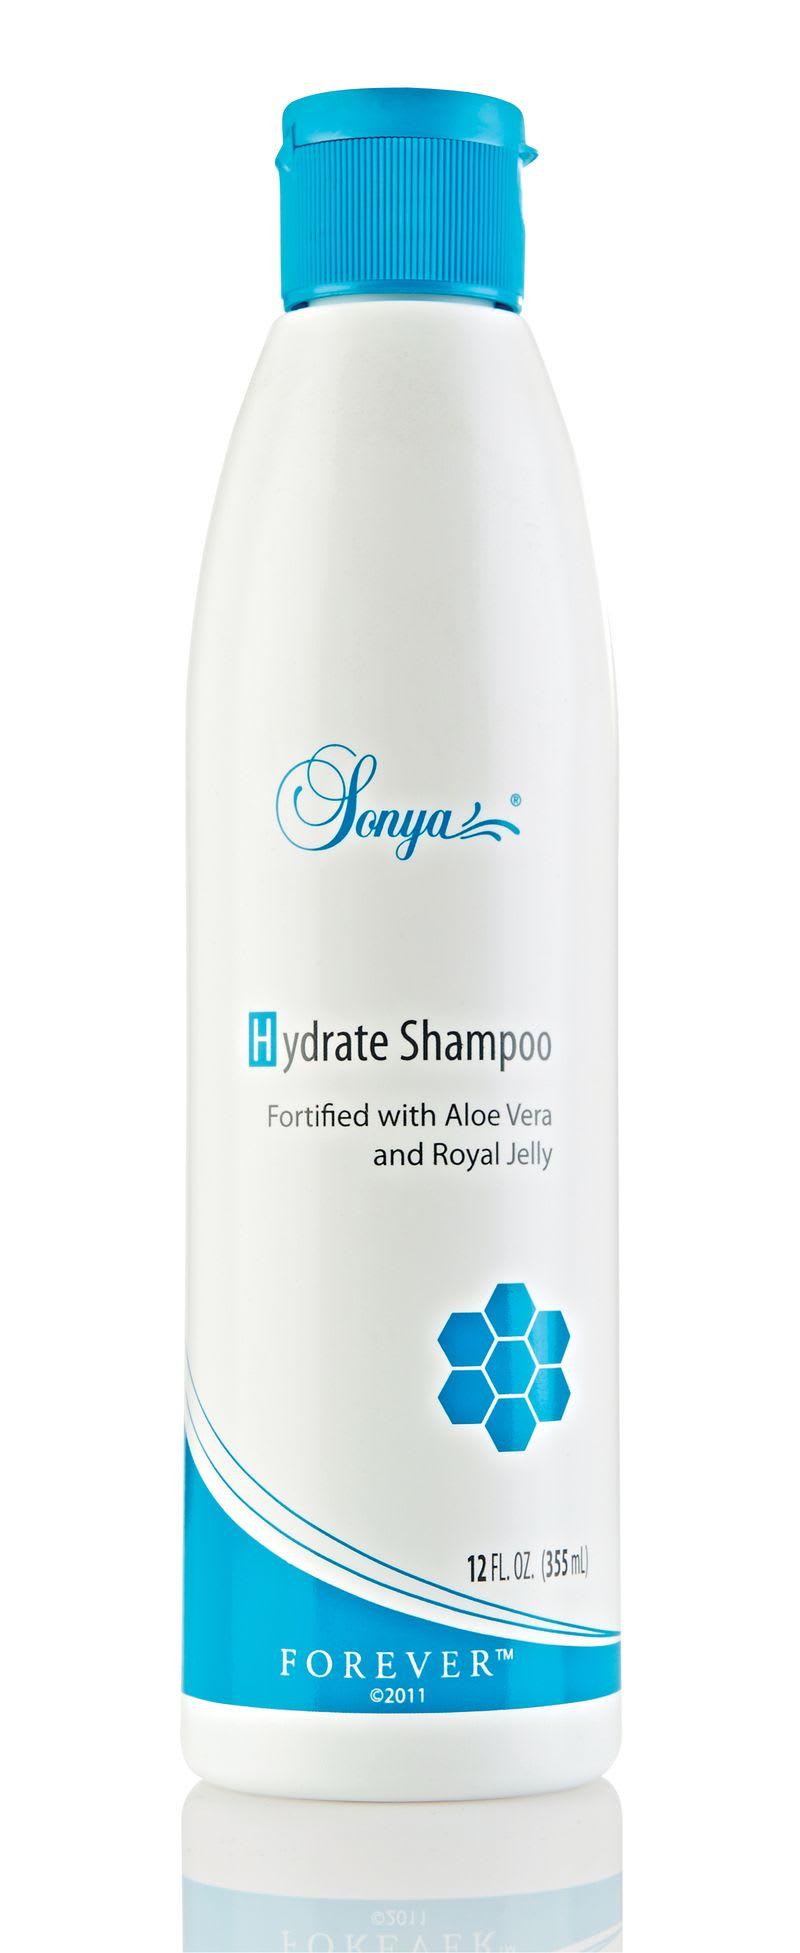 Forever Sonya Hydrate Shampoo